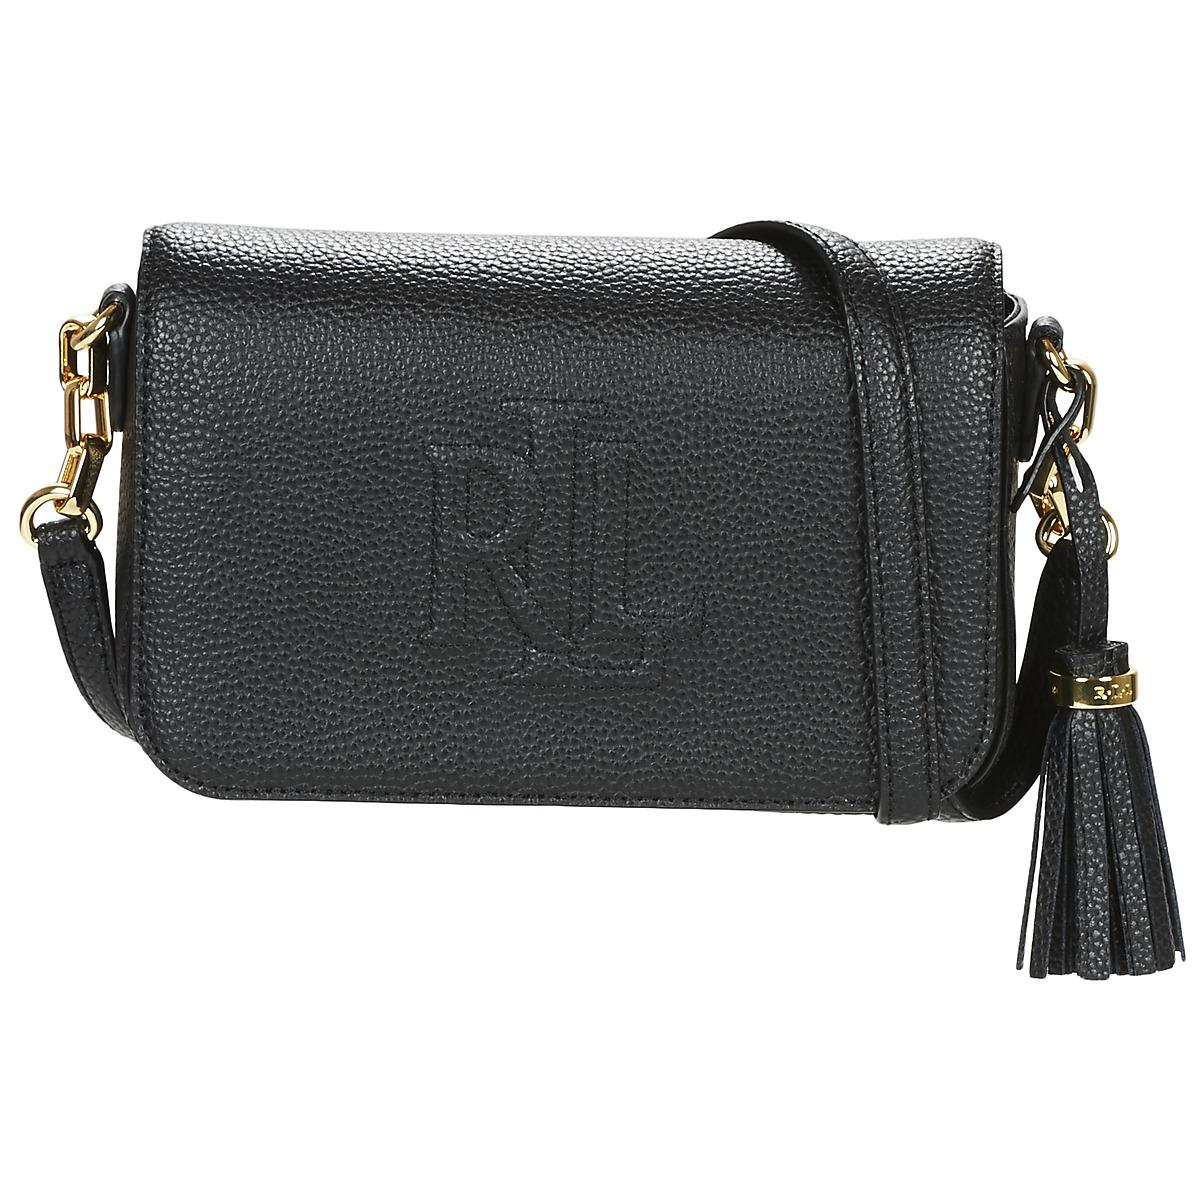 more photos wholesale sales good texture Anstey Carmen Crossbody Women's Shoulder Bag In Black